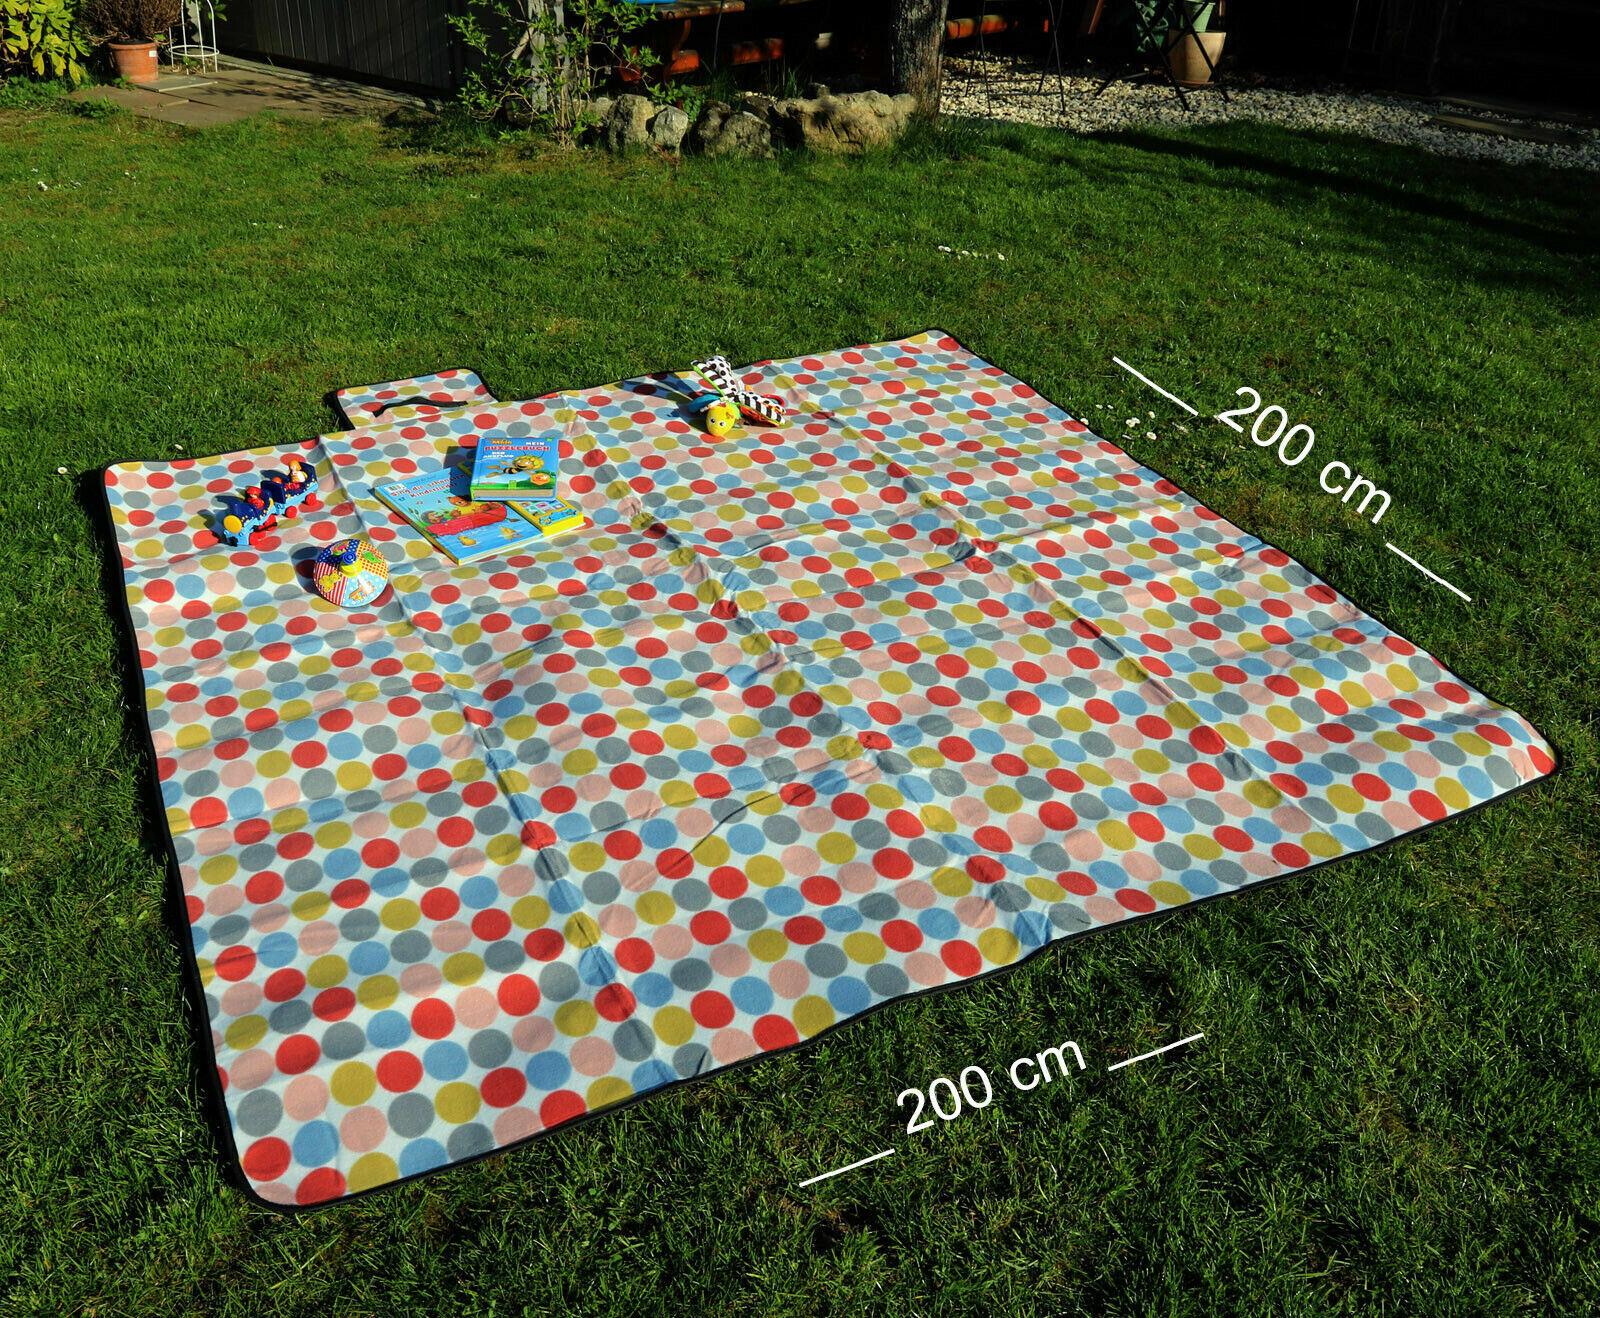 Picknickdecke wasserdicht Campingdecke Strandmatte Isomatte Outdoor Decke 300cm